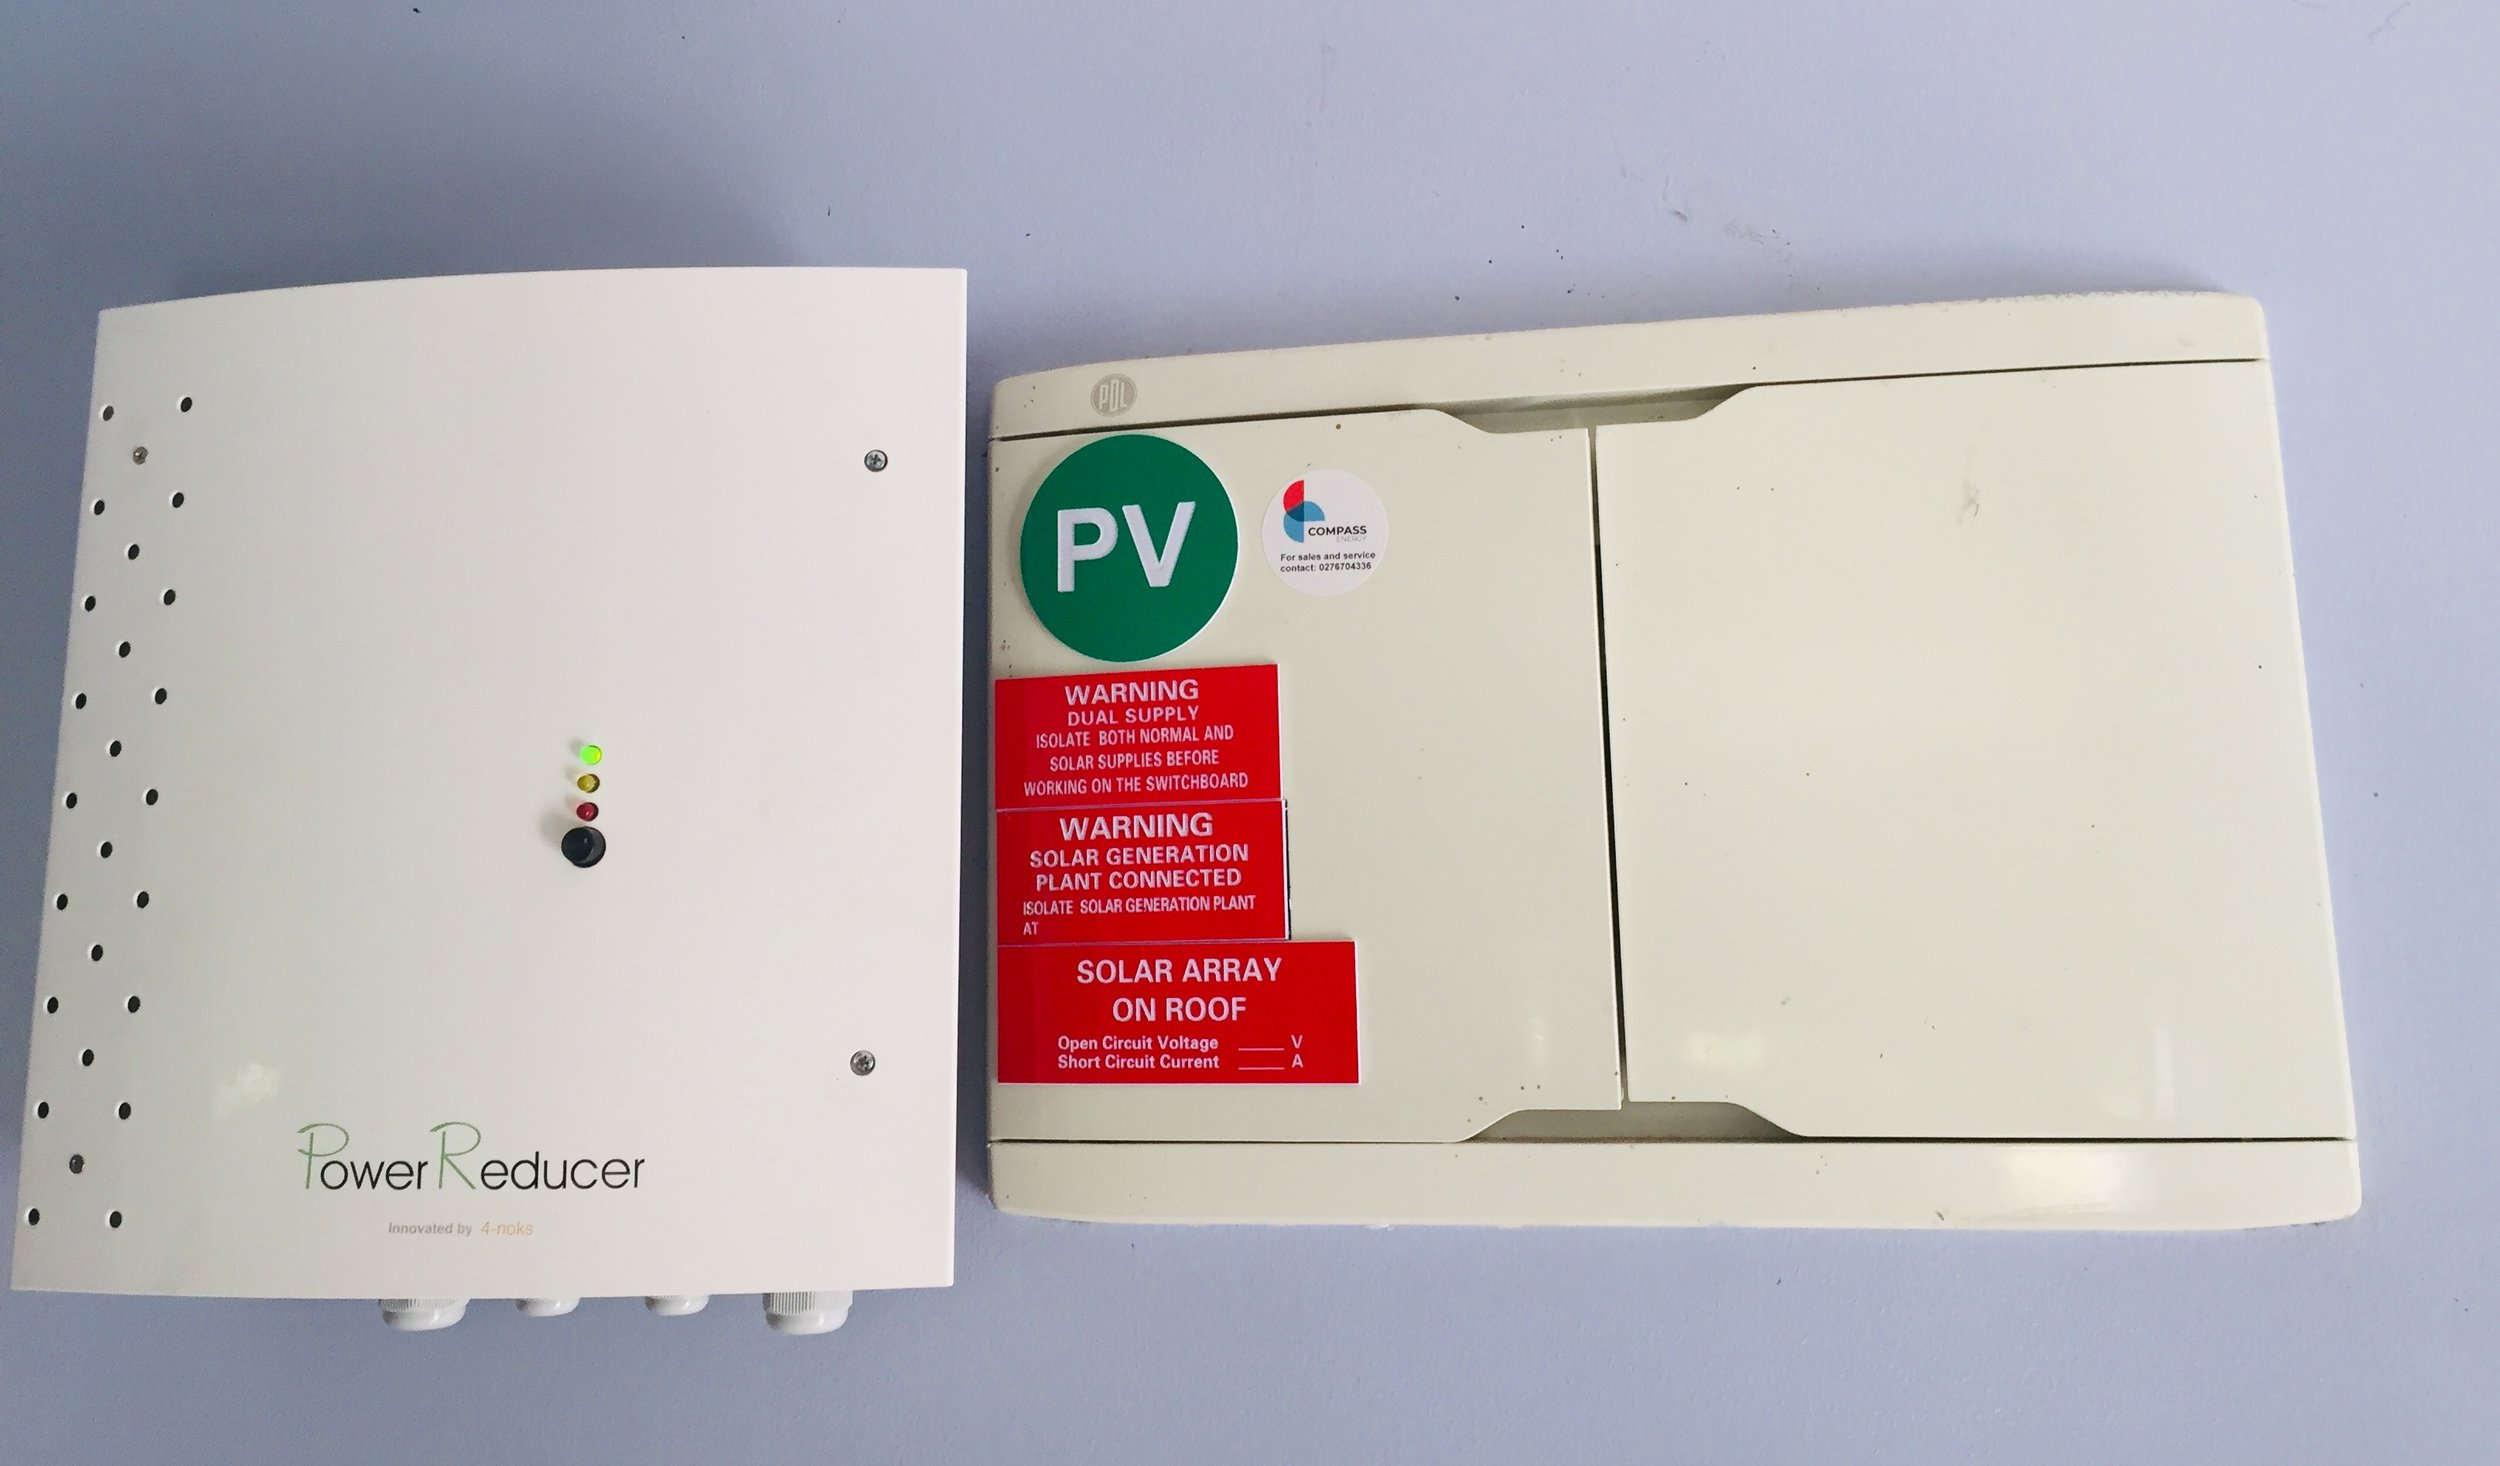 Hot water power reducer installation